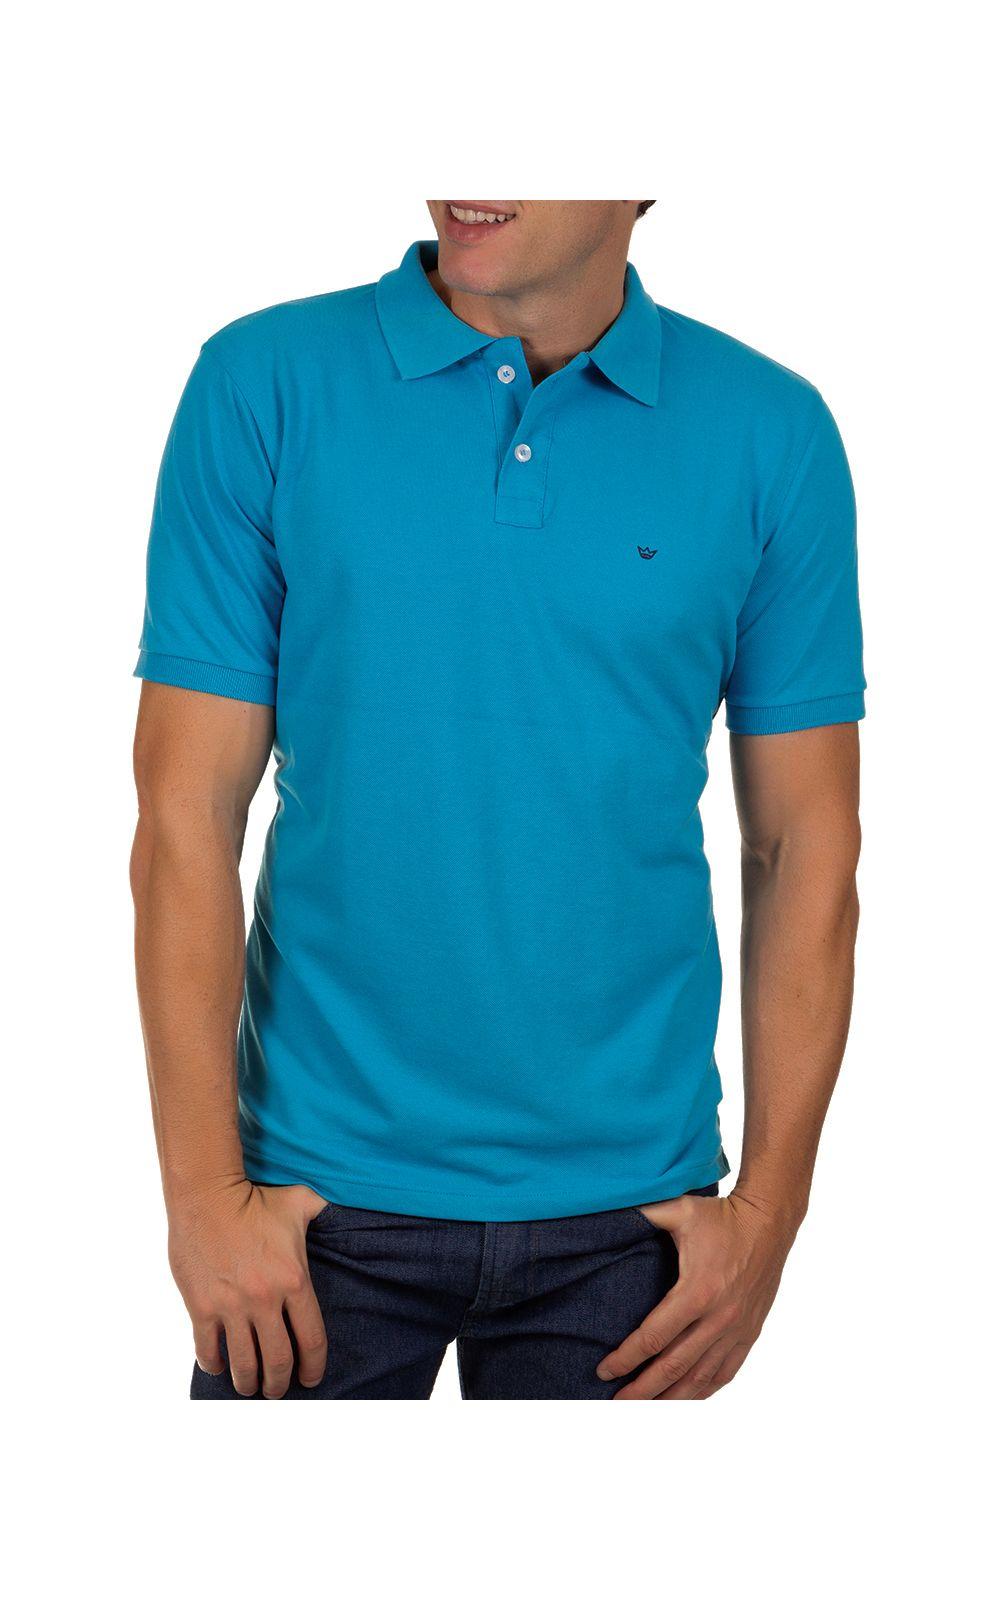 Foto 1 - Camisa Polo Masculina Azul Claro Lisa